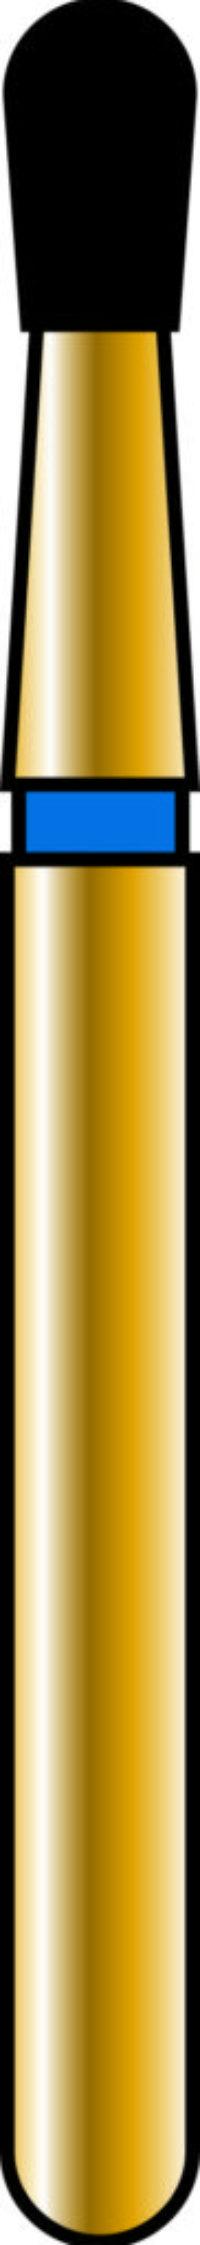 Pear 16-2.7mm Gold Diamond Bur - Coarse Grit